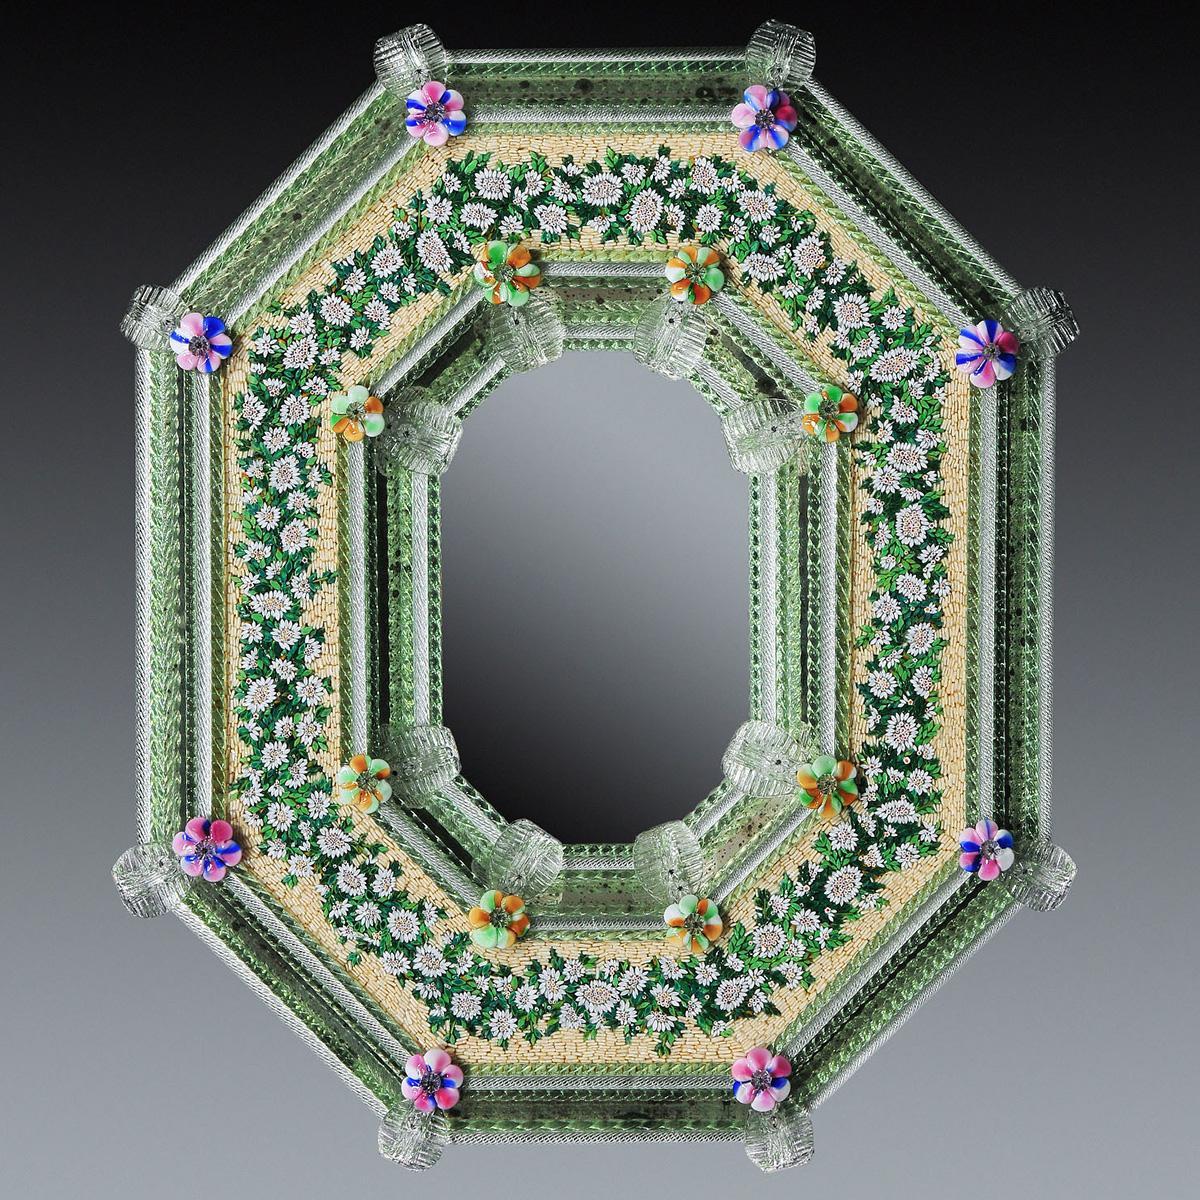 """Estella "" miroir vénitien en verre de Murano"